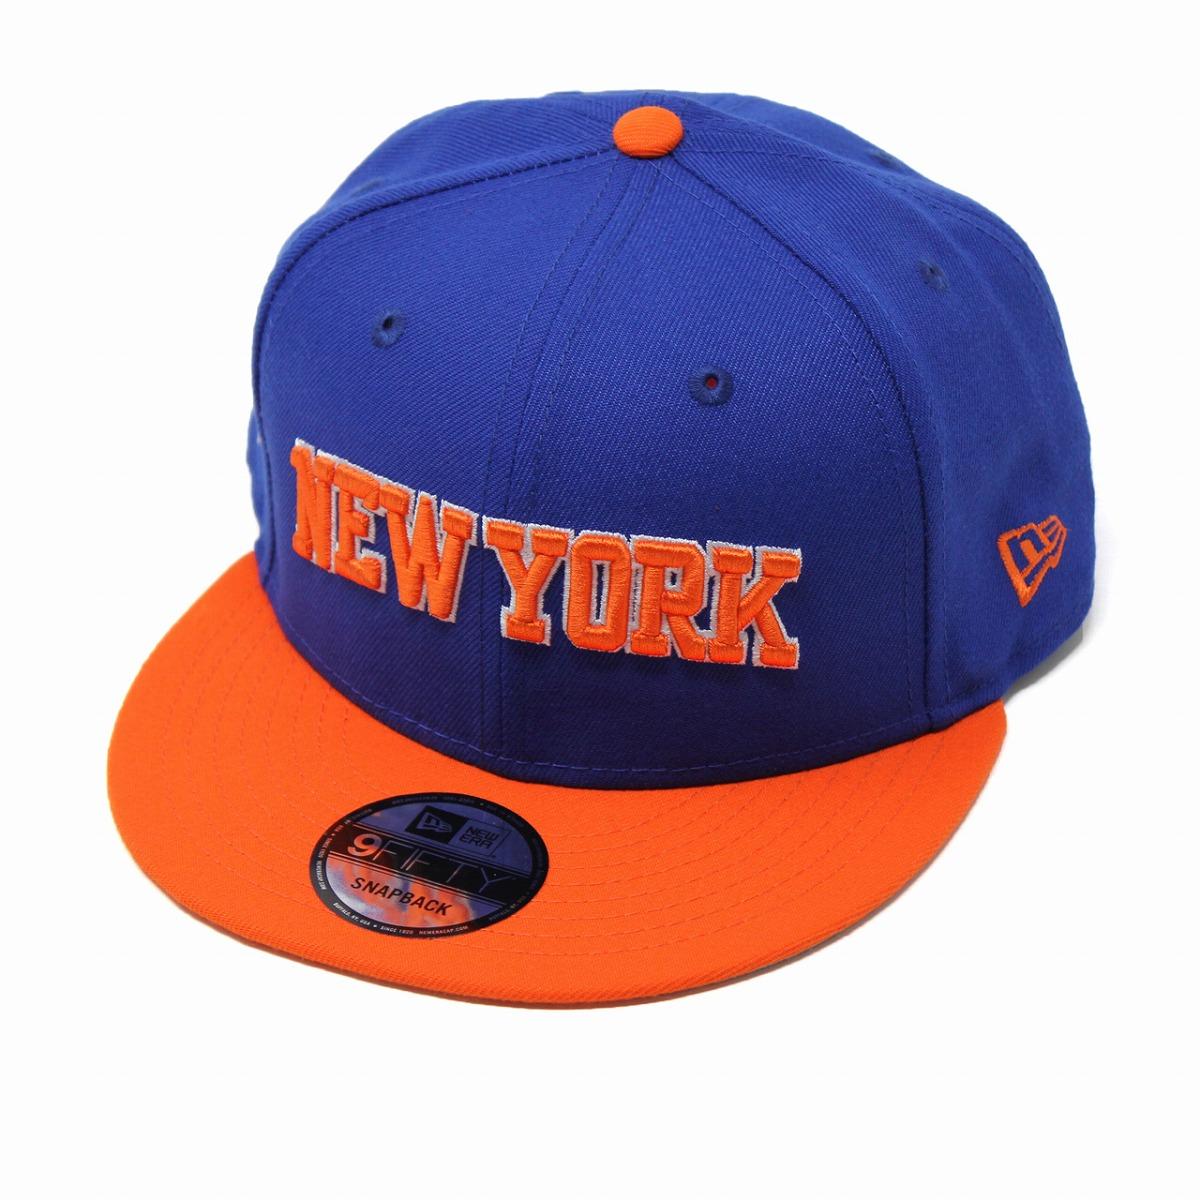 huge discount b3ac4 b1234 ELEHELM HAT STORE  NEWERA cap men 9FIFTY new gills cap hat NBA basket  league embroidery street   New York Knicks in the fall and winter   Rakuten  Global ...